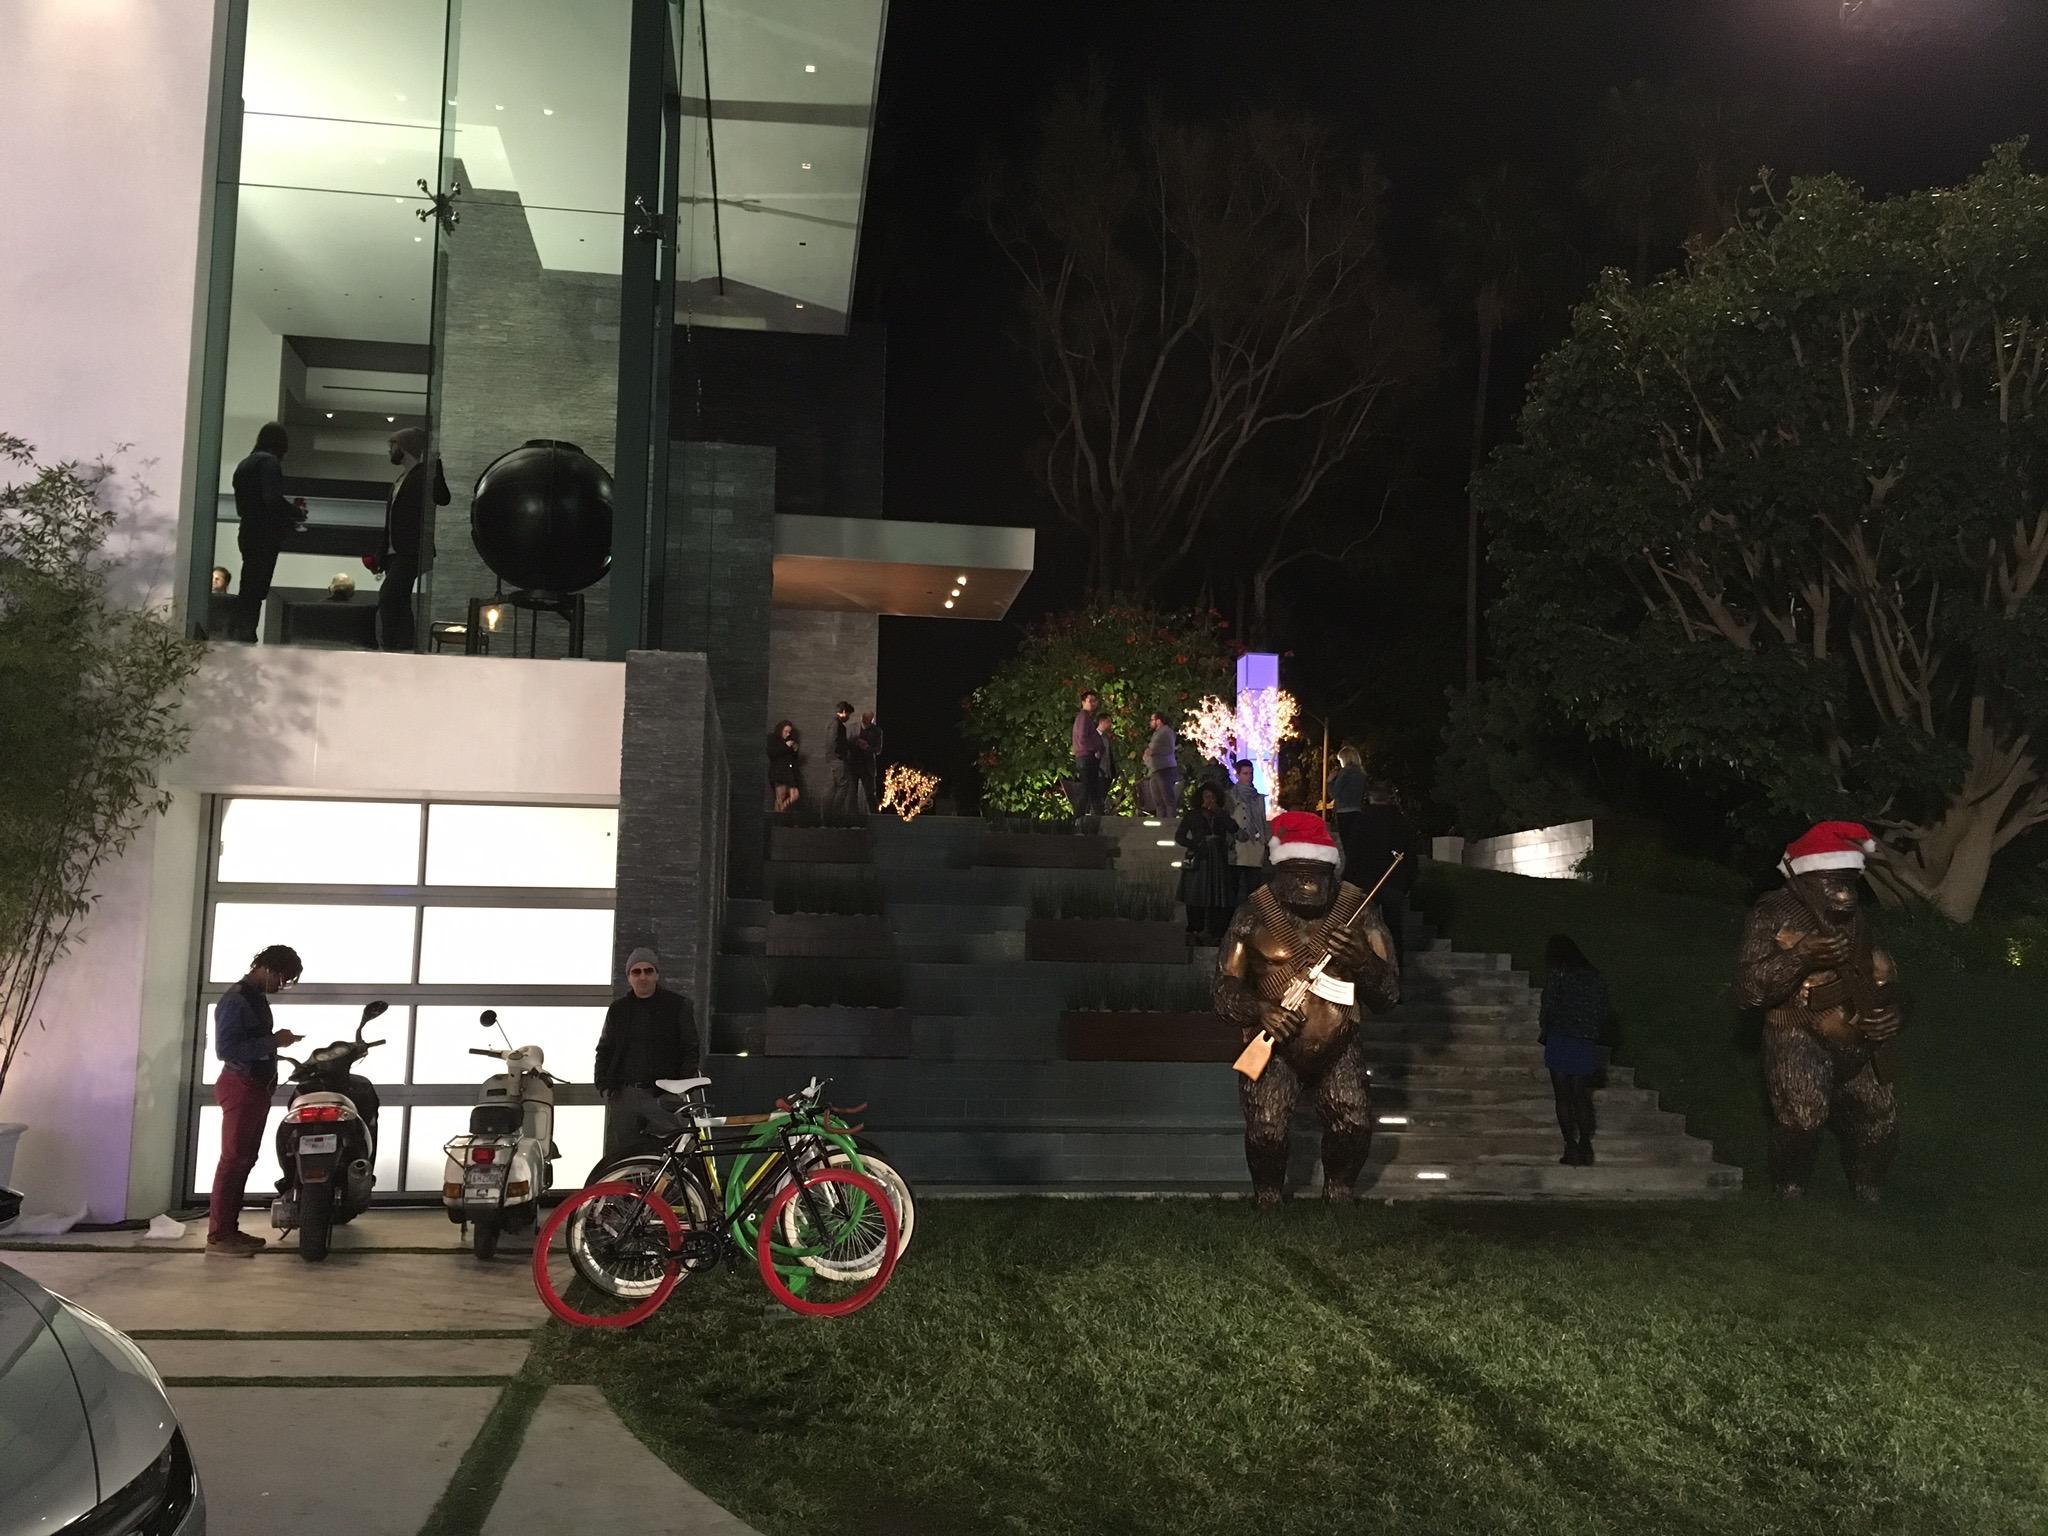 Greenstar Bikes - Why Him - pict 1.jpg